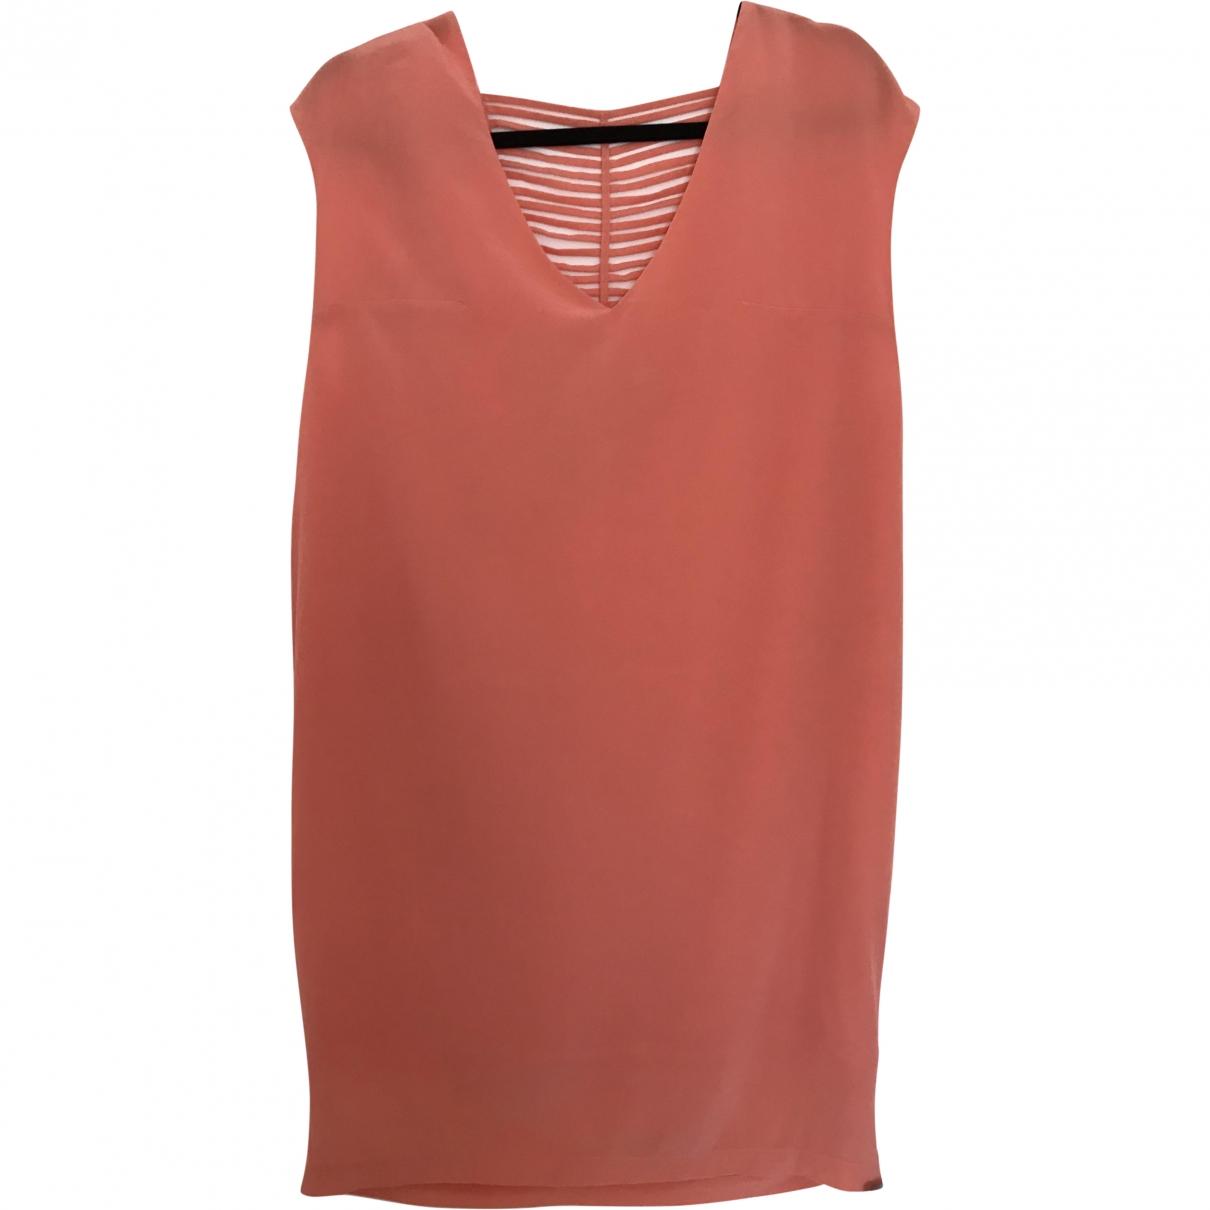 Bel Air \N Orange Silk dress for Women 38 FR